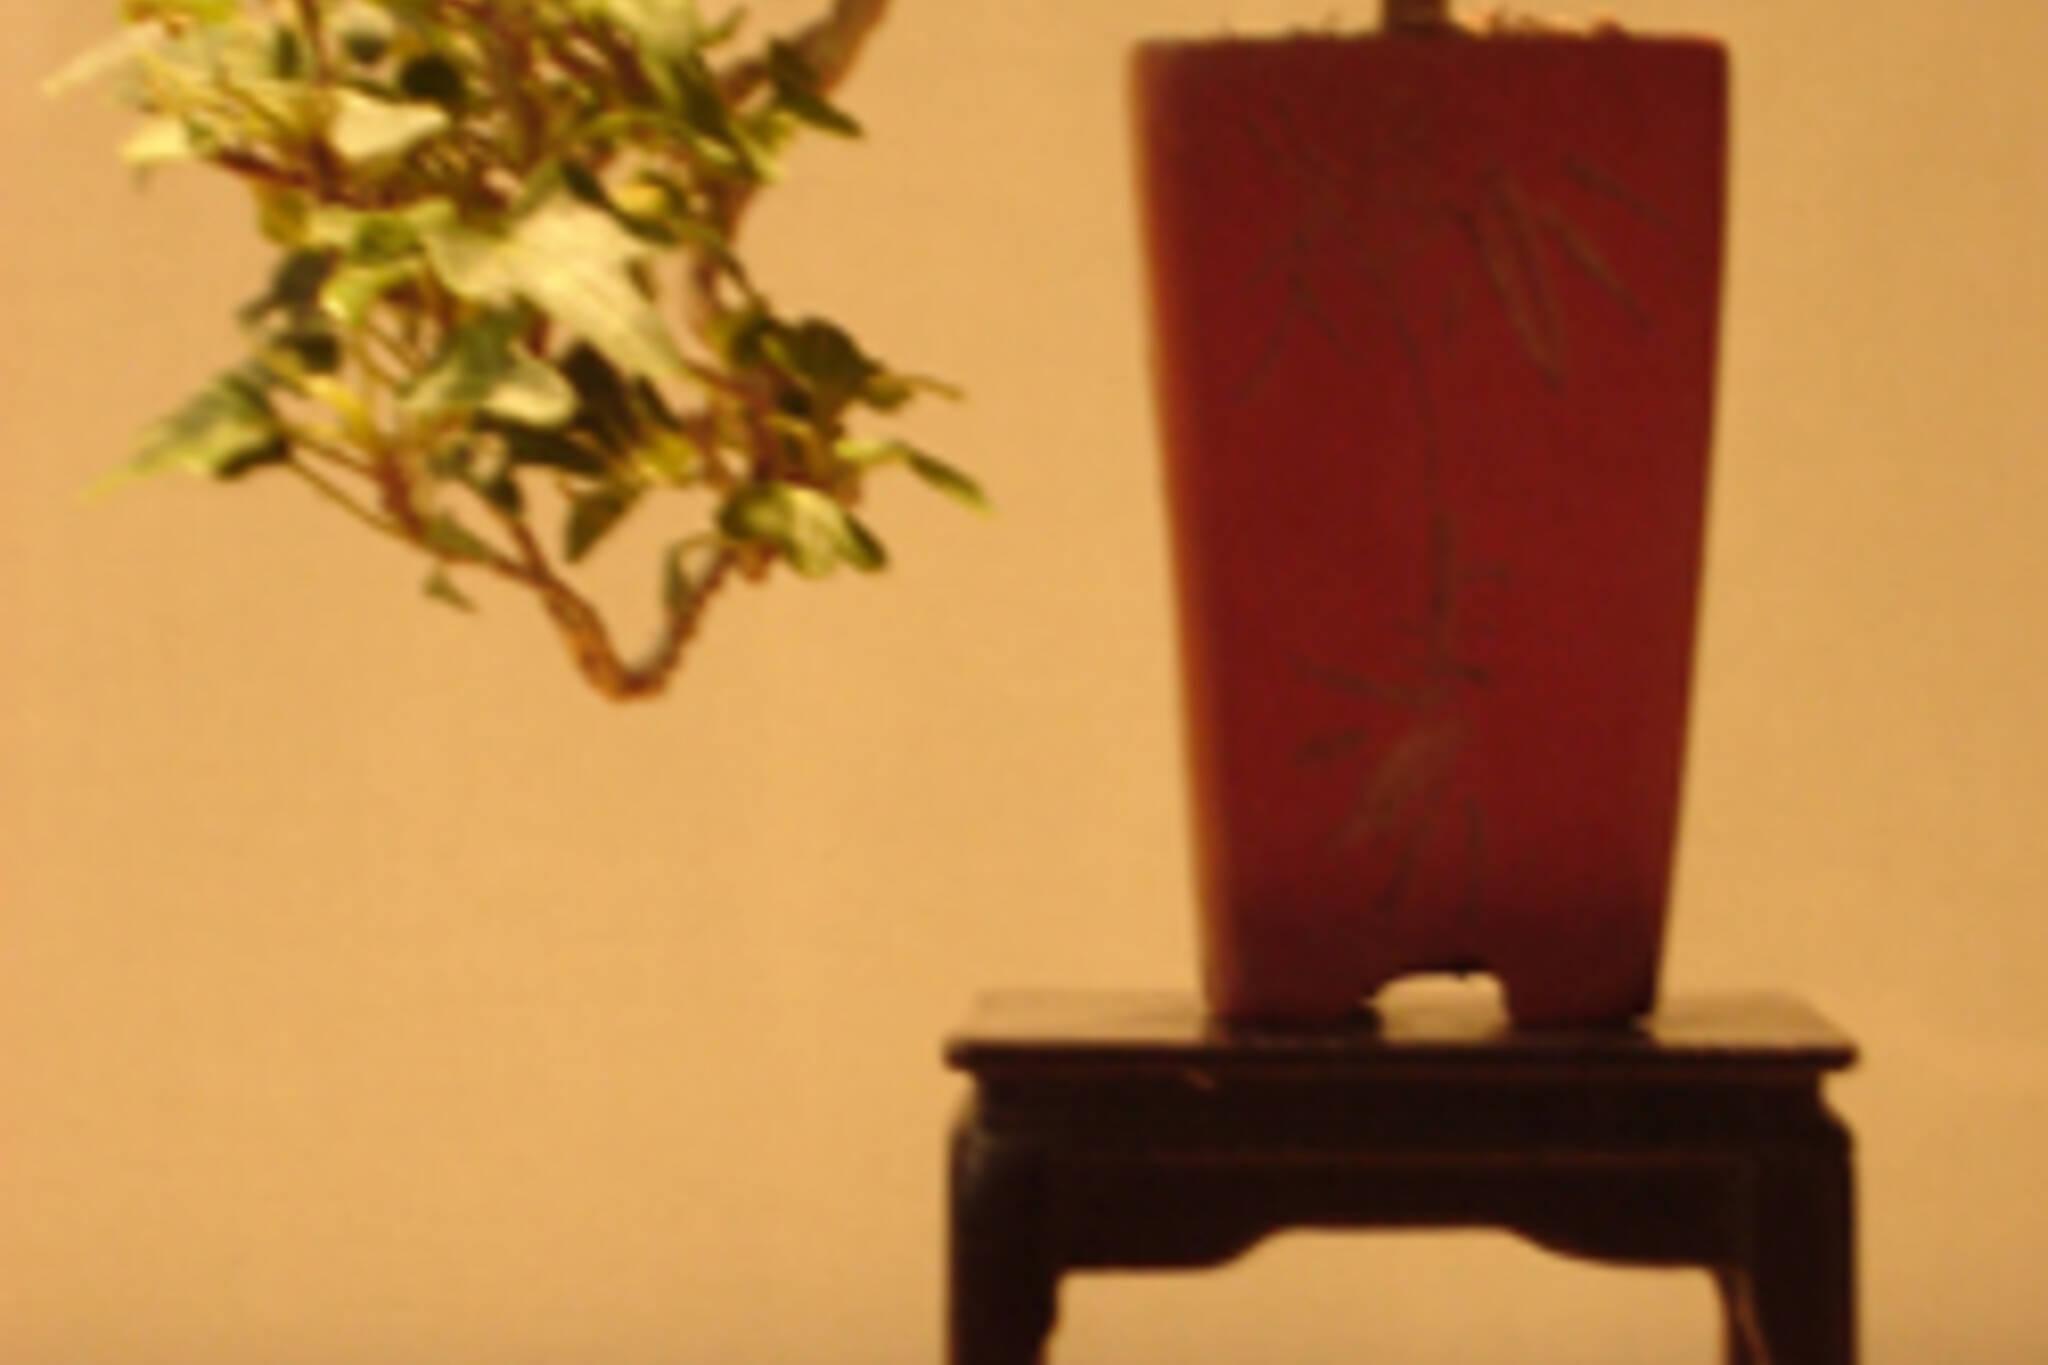 08_10_2007_bonsaishowandsale.jpg